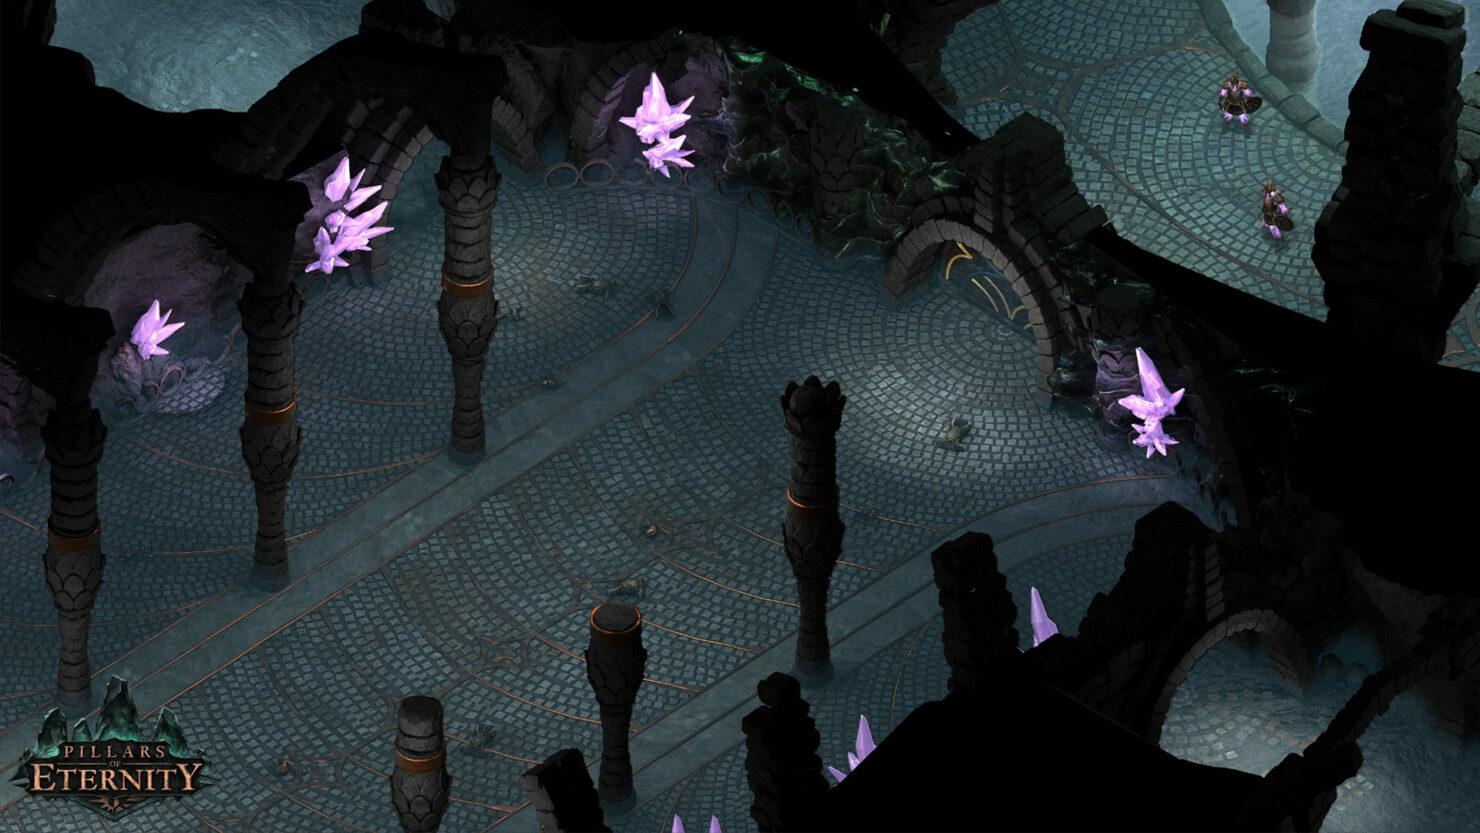 pillars-of-eternity-7